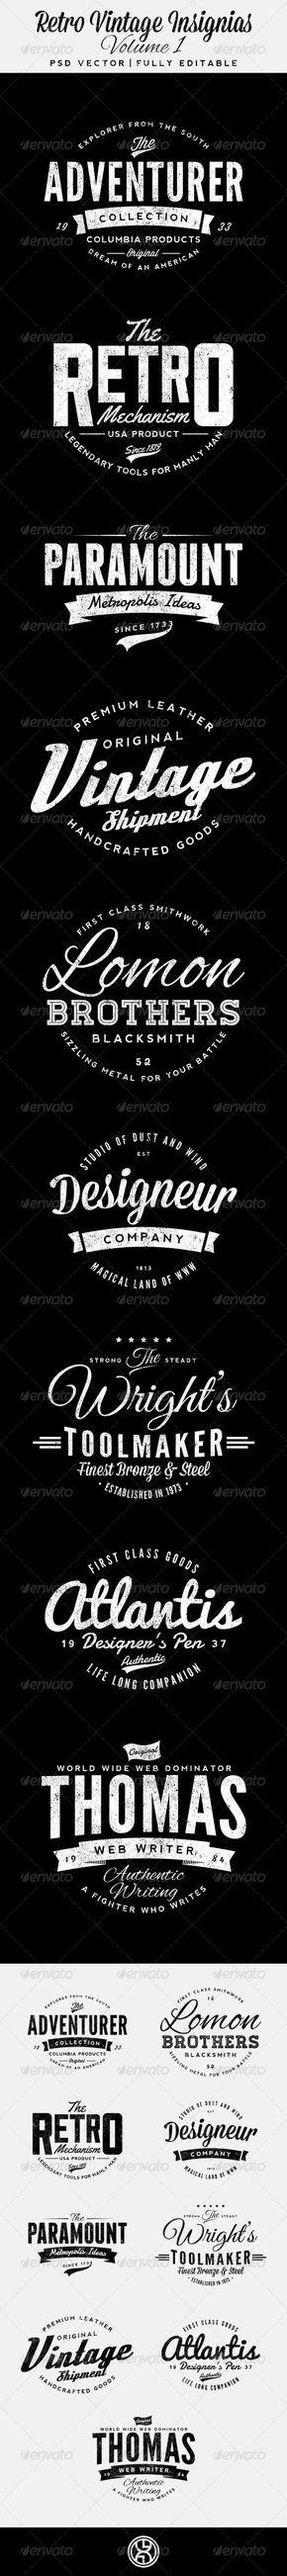 Retro Vintage Insignias Volume 1 - Badges & Stickers Web Elements